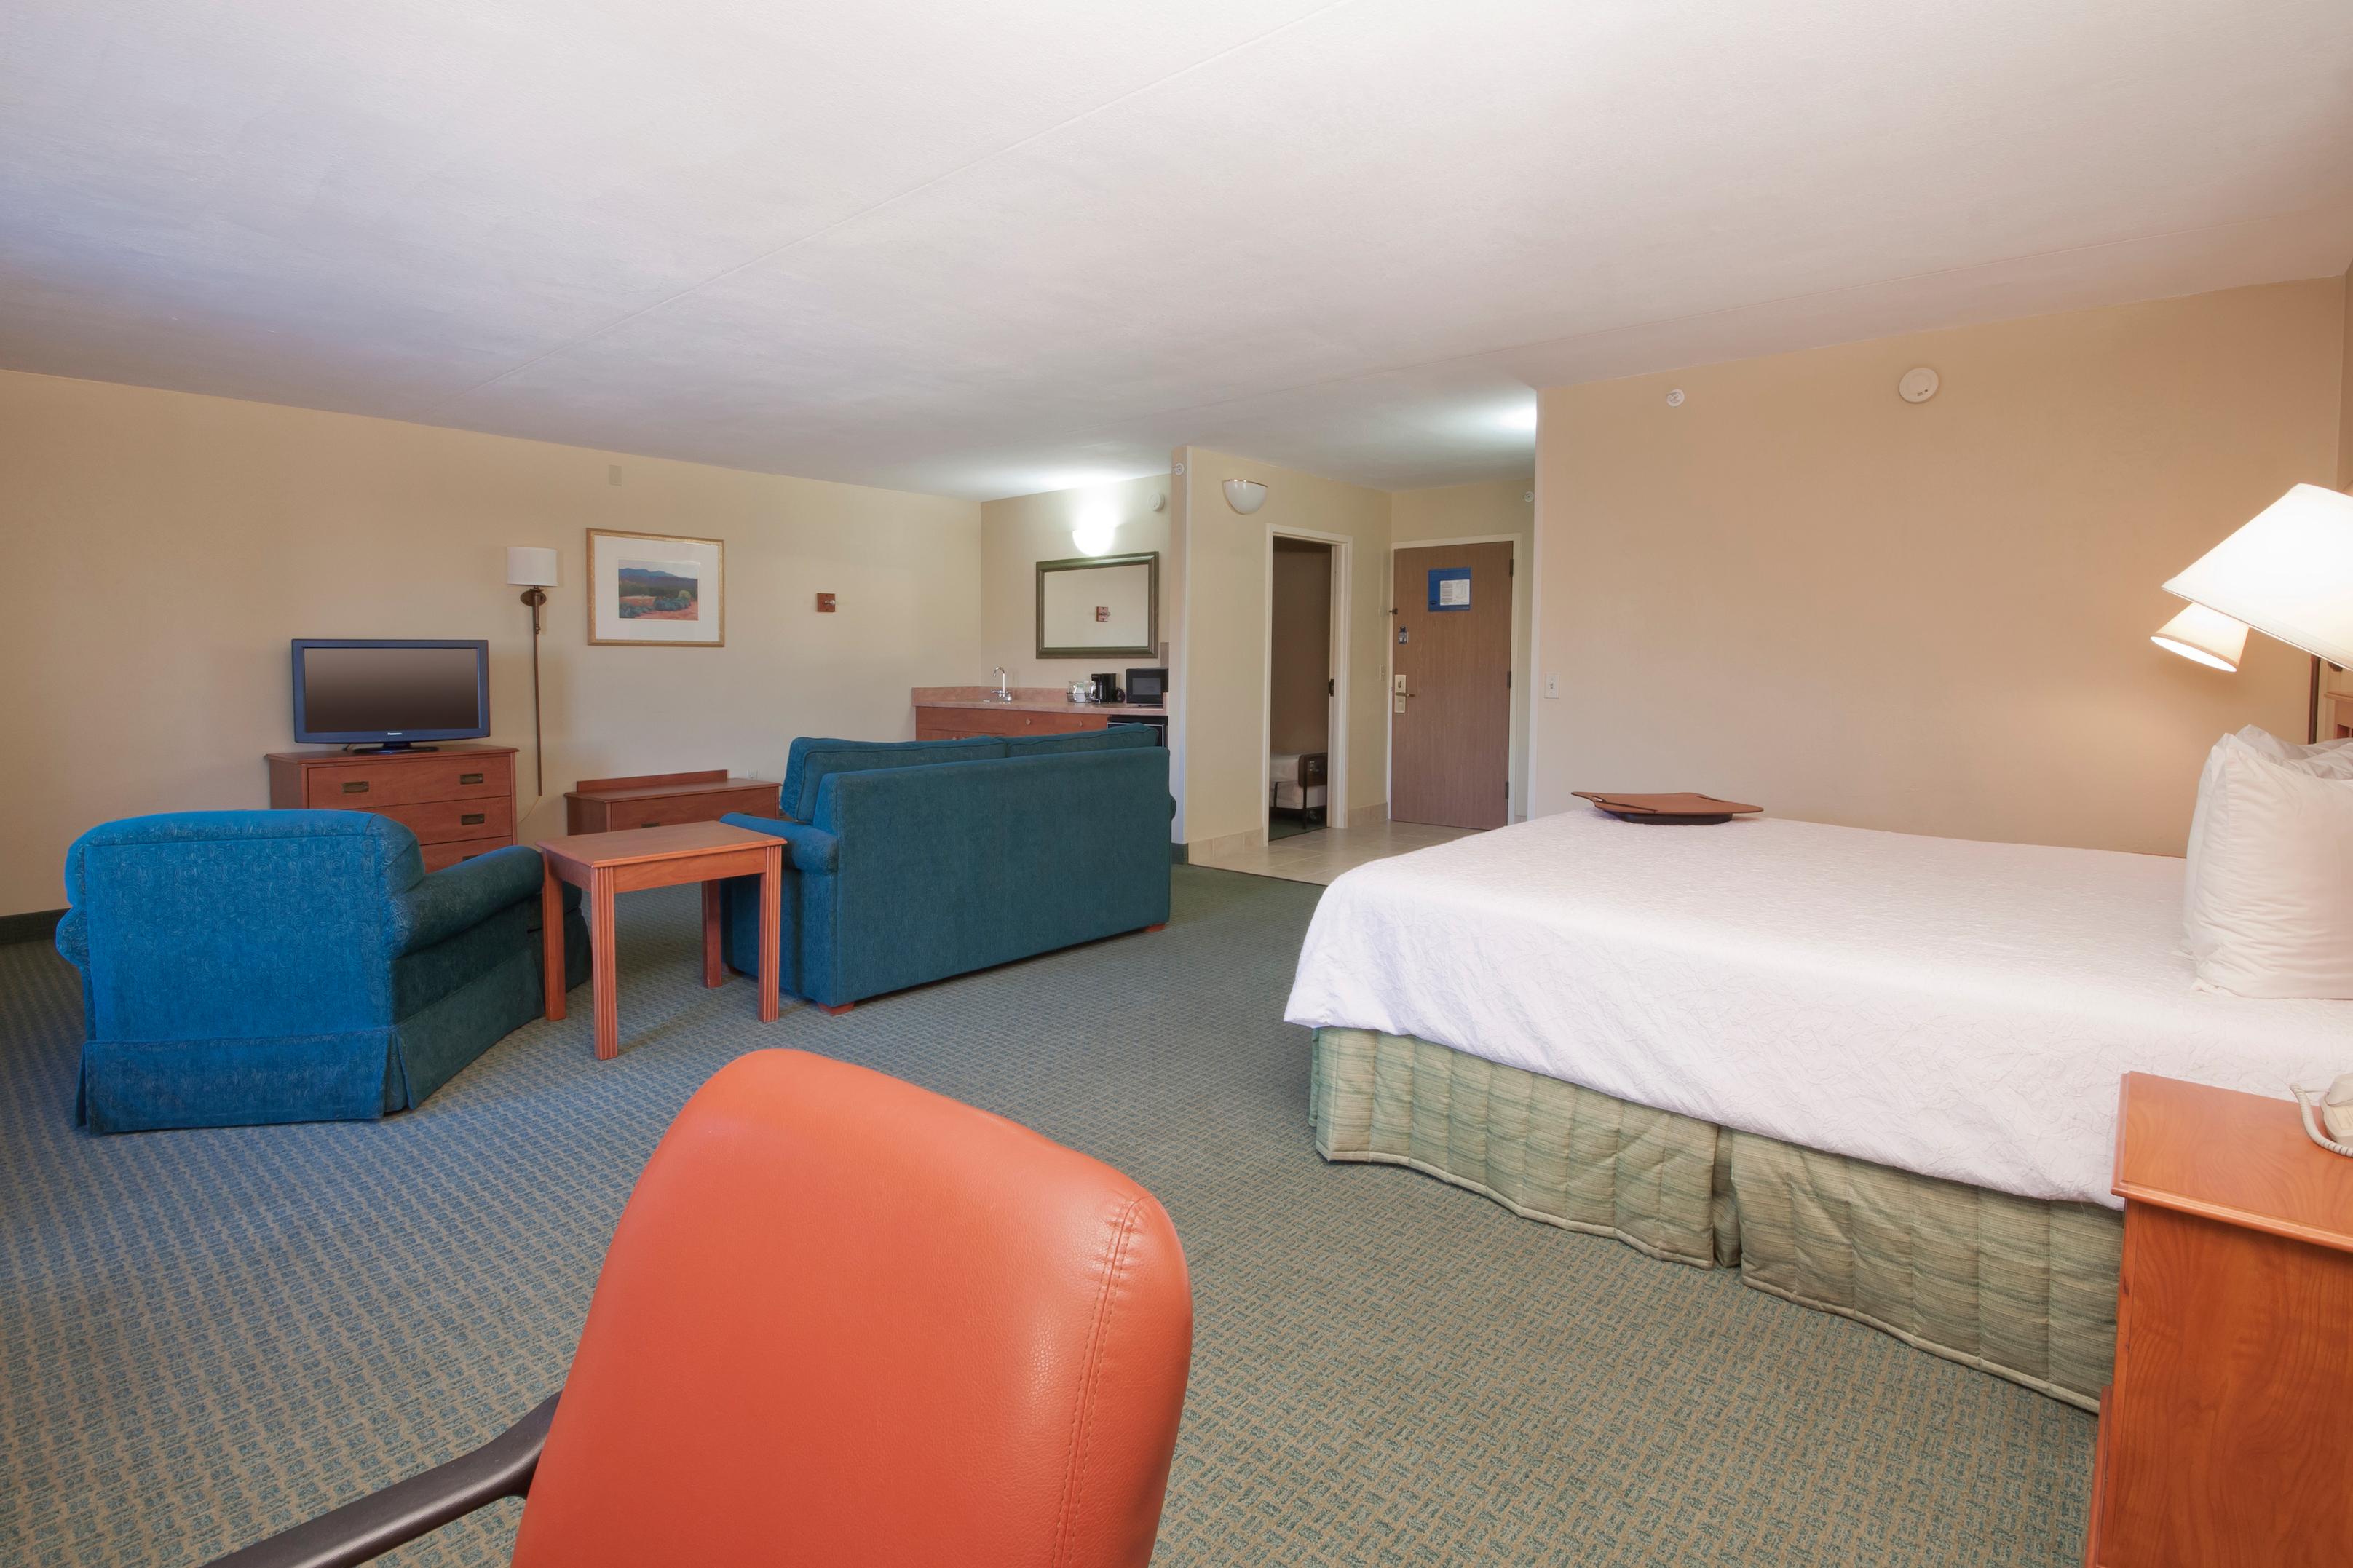 Hampton Inn Sedona Sedona Arizona Az Localdatabase Com